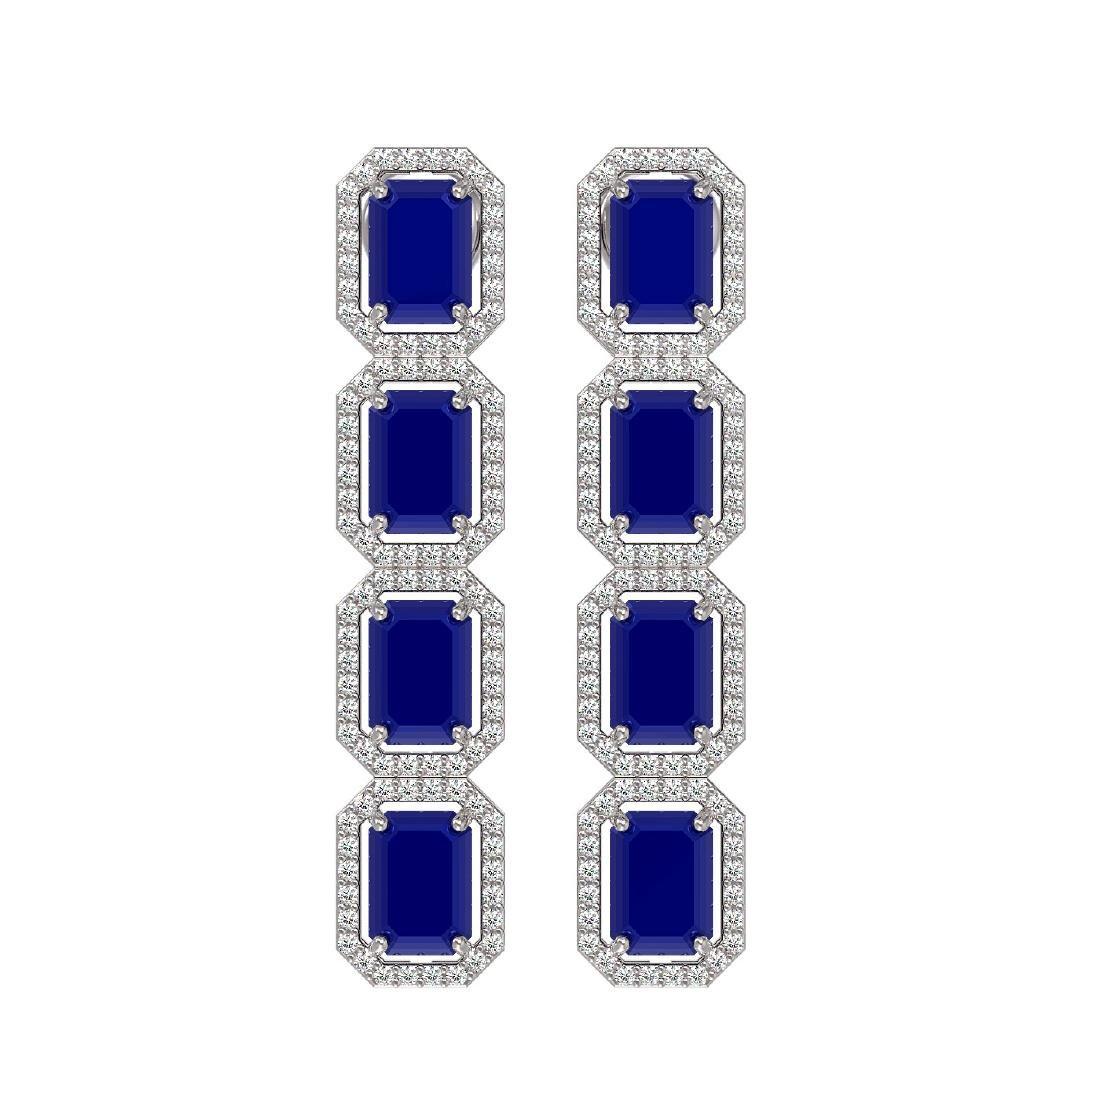 12.33 CTW Sapphire & Diamond Halo Earrings 10K White